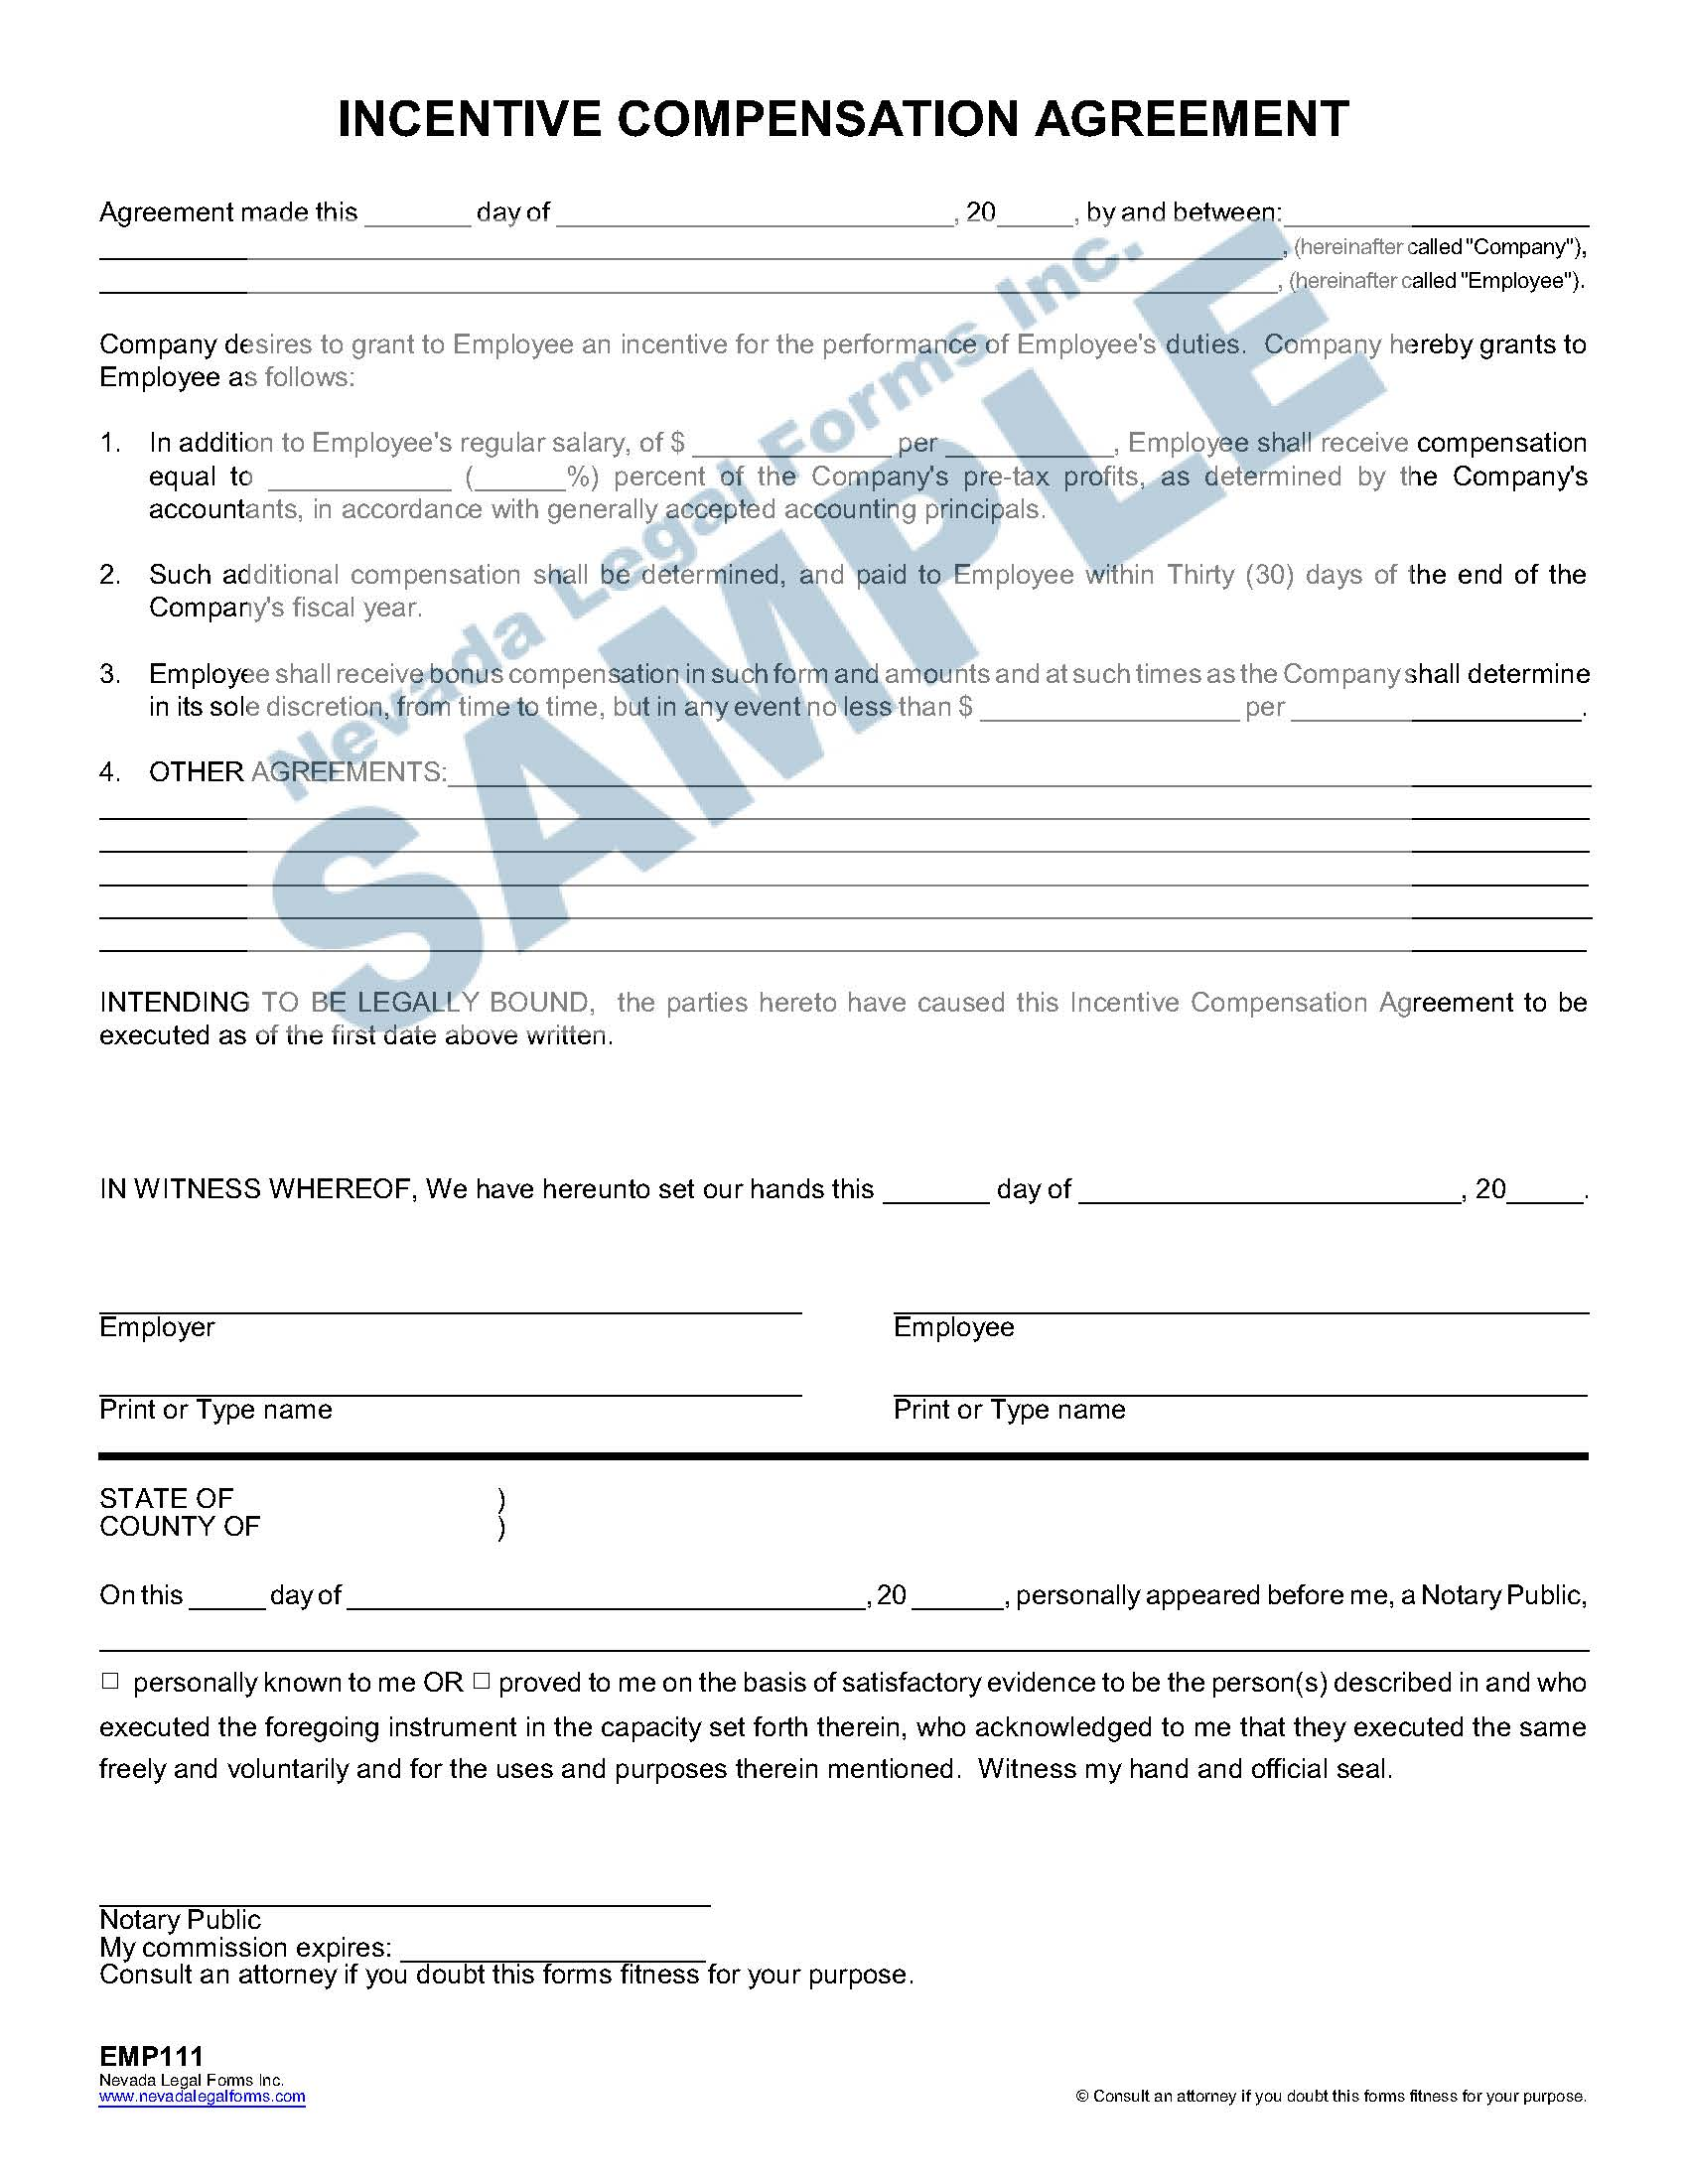 Incentive Compensation Agreement